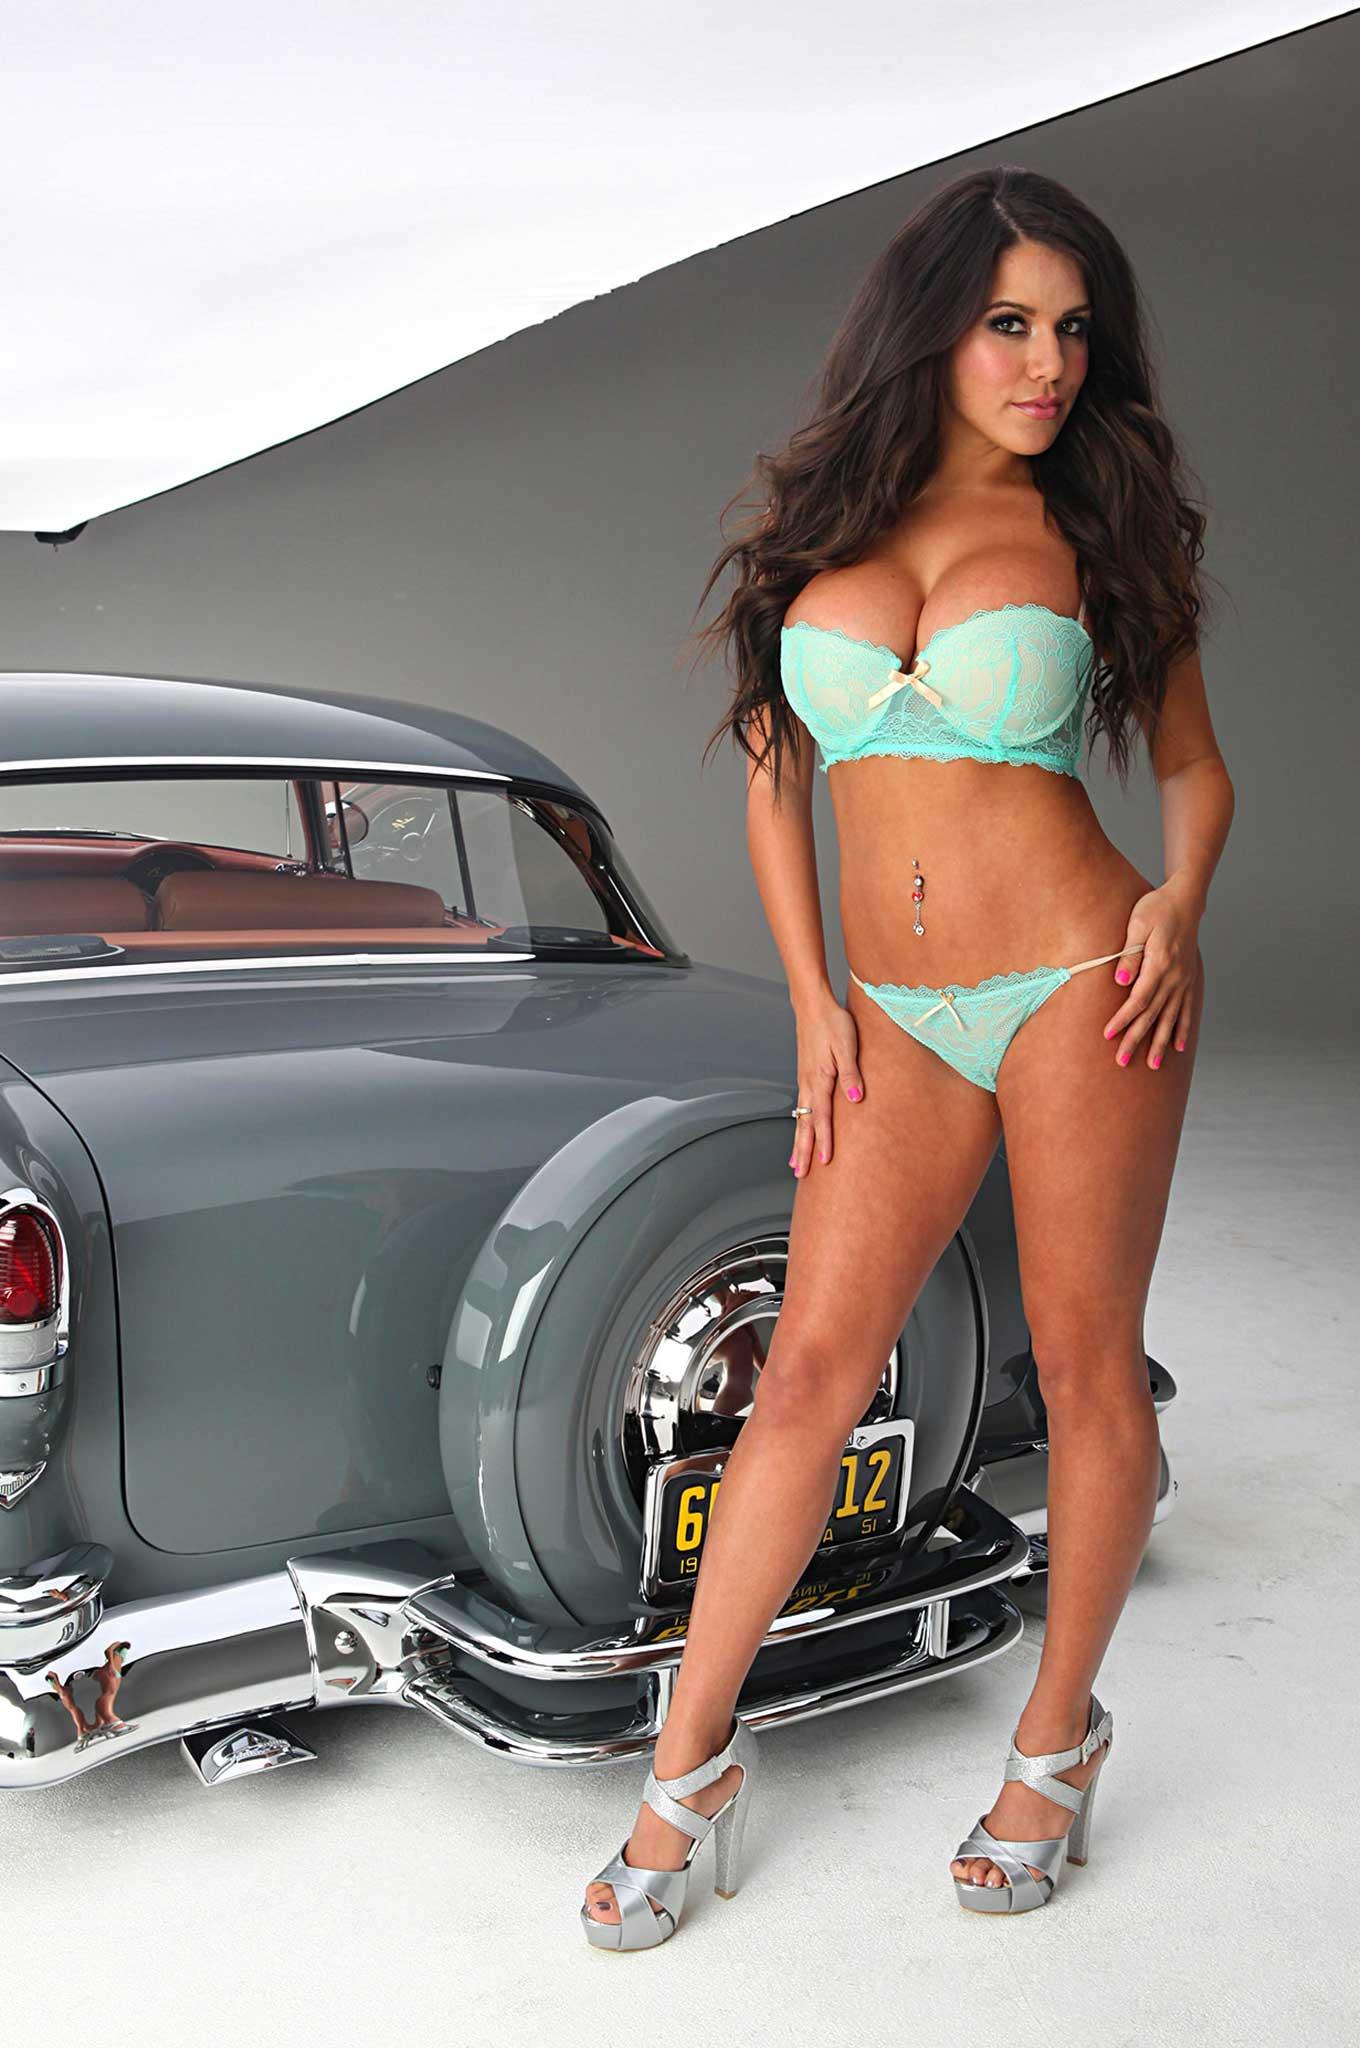 Corvette Girl Wallpaper Never Before Seen Pictures Of Chantel Zales